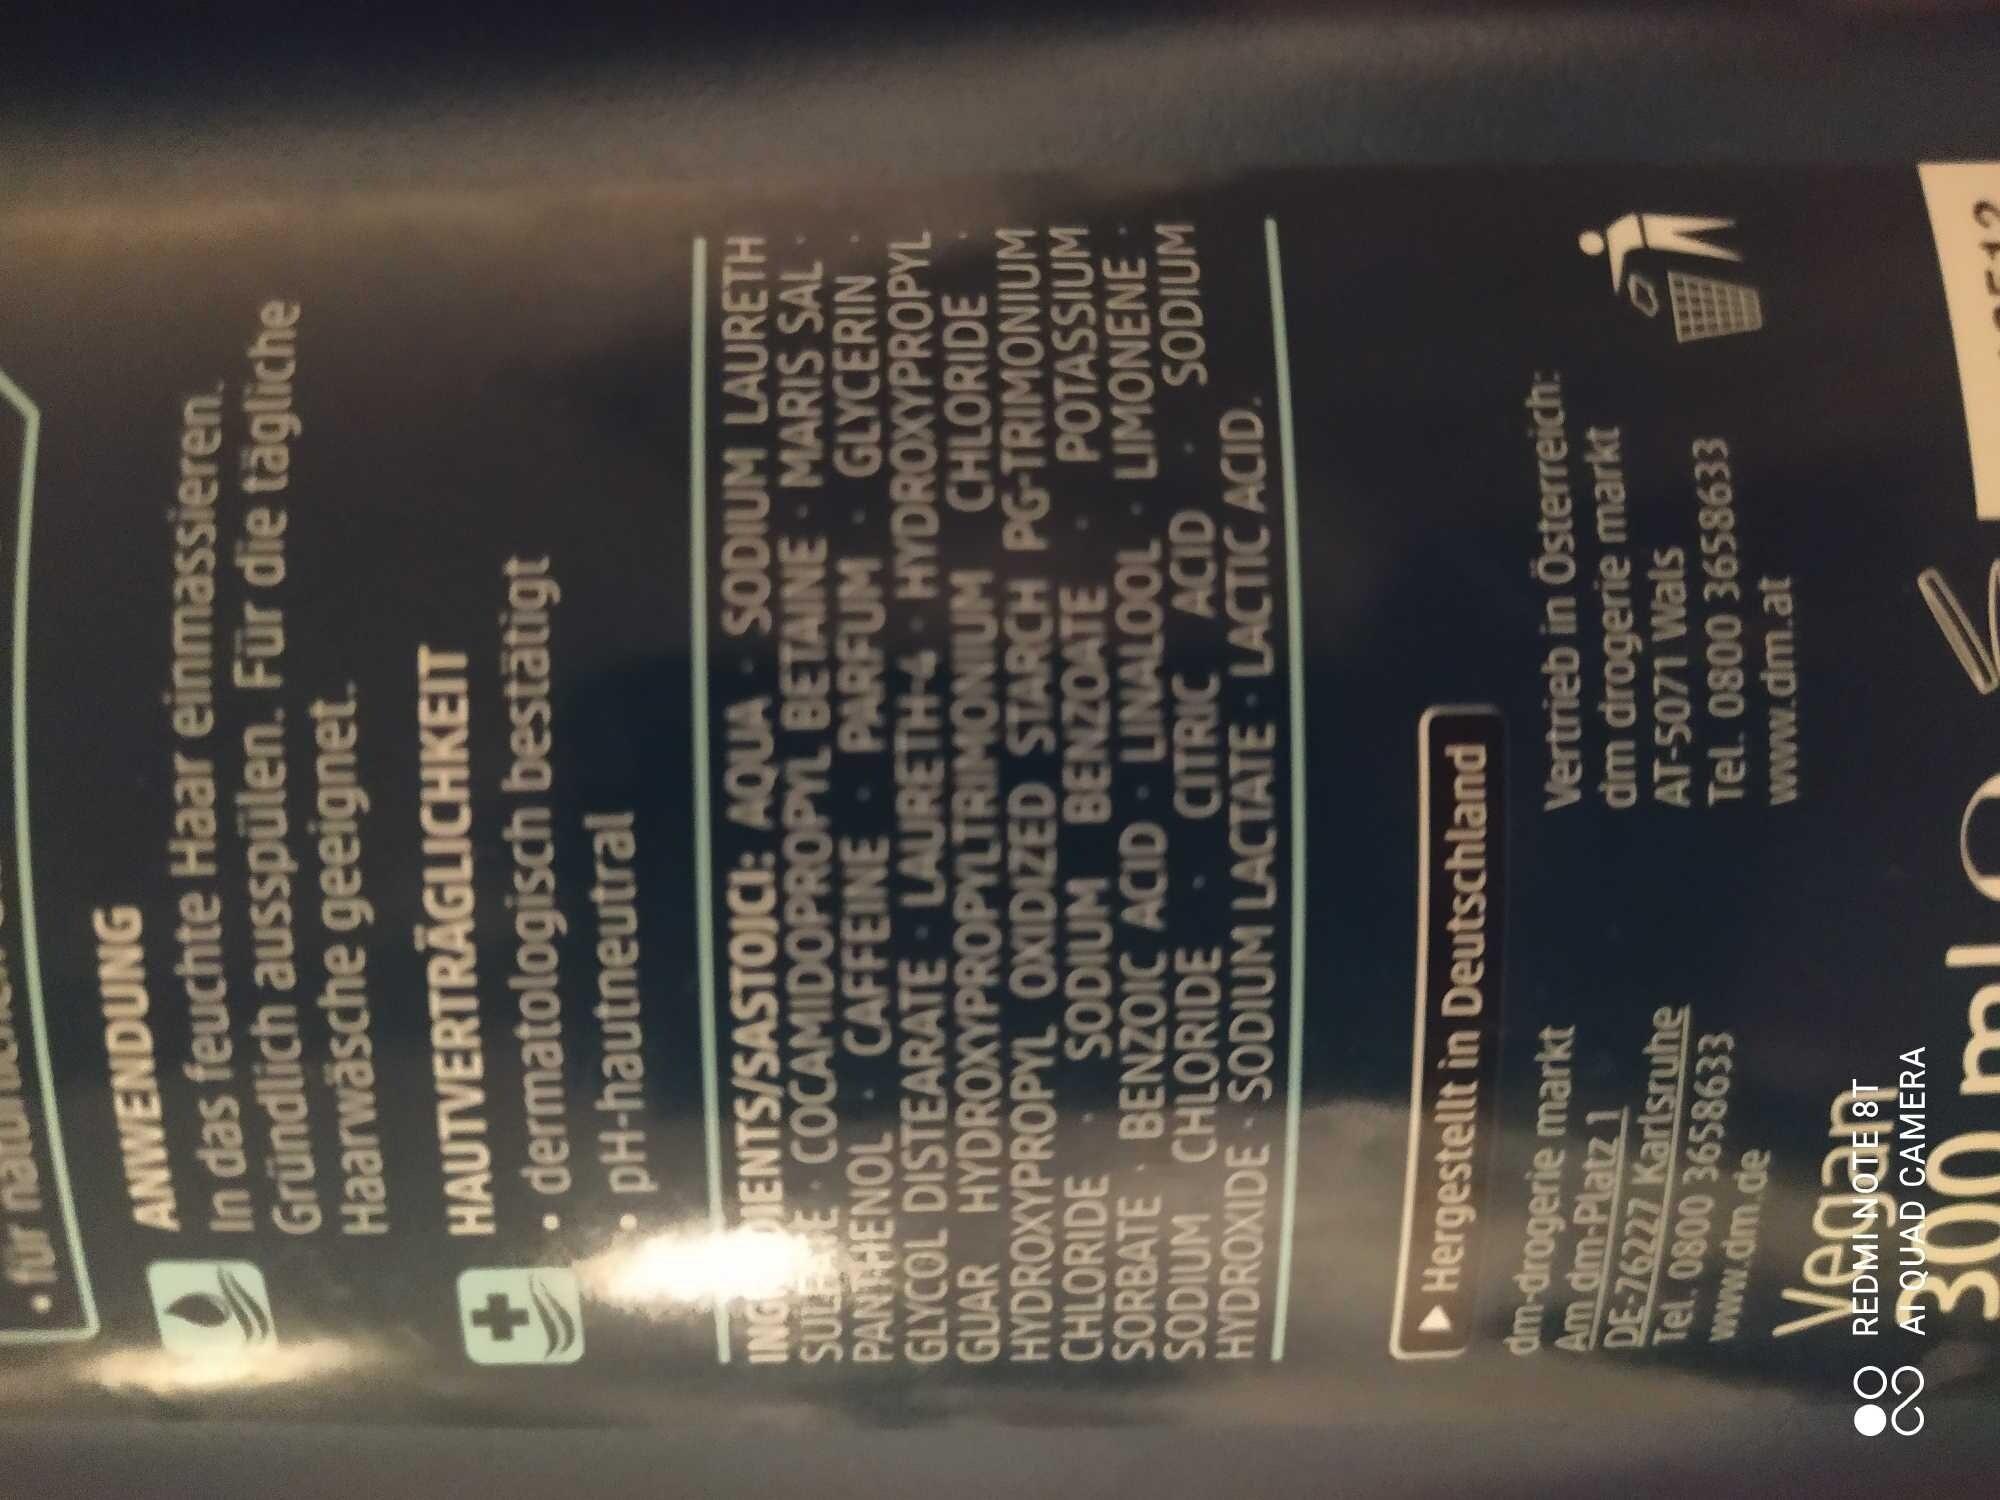 Balea m'en fresh Shampoo - Produit - fr